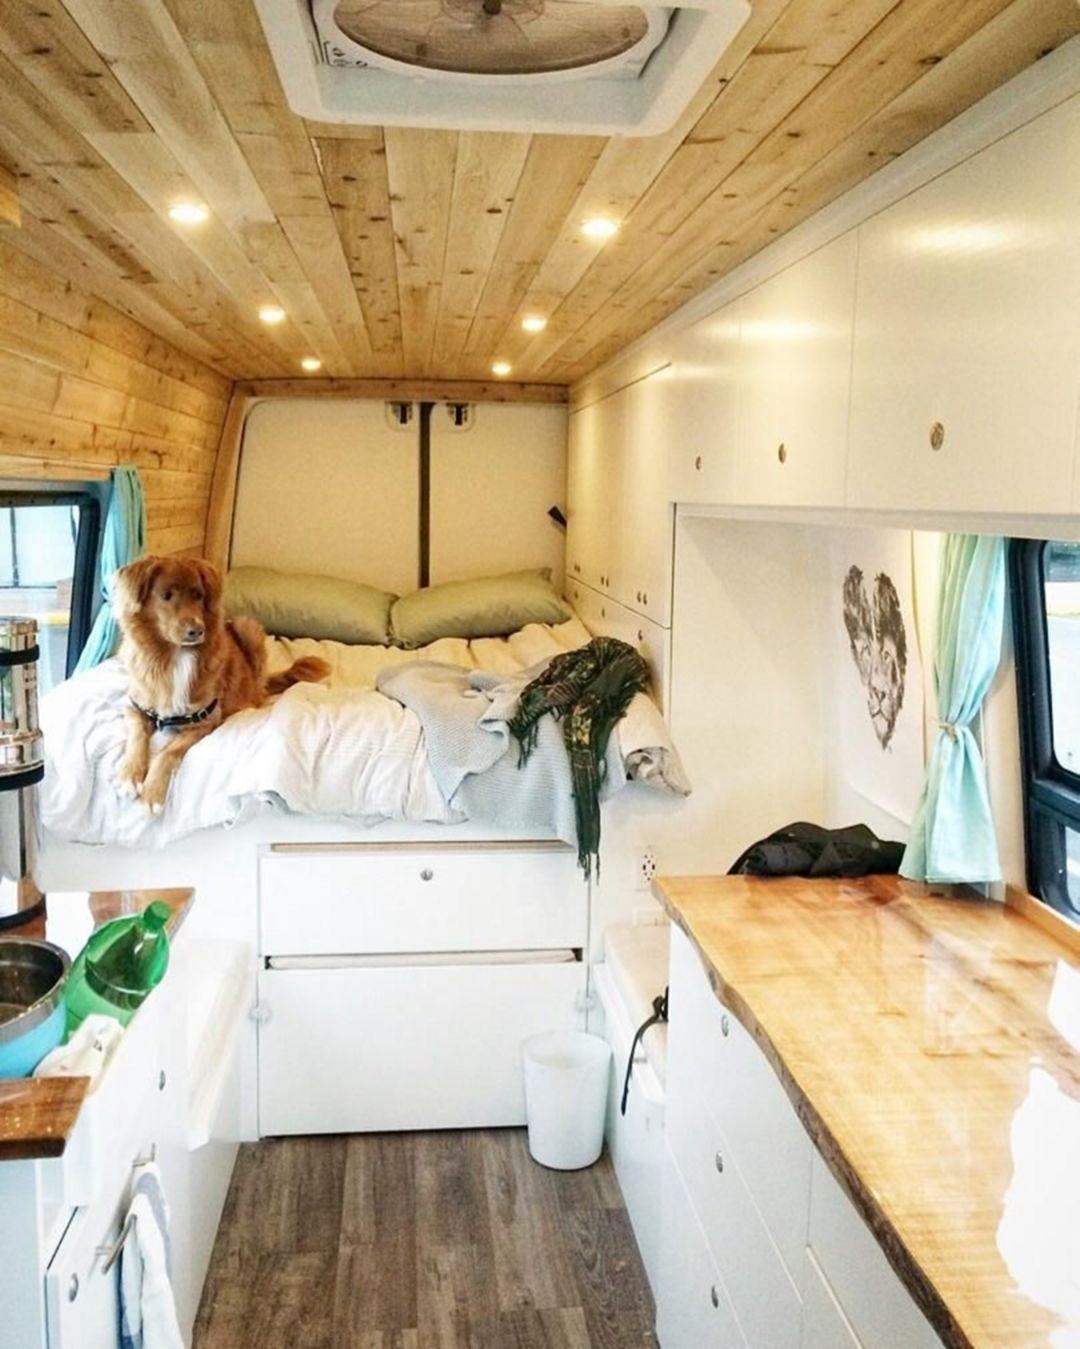 Pin by Nina on Van life  Van life diy, Camper interior, Van life